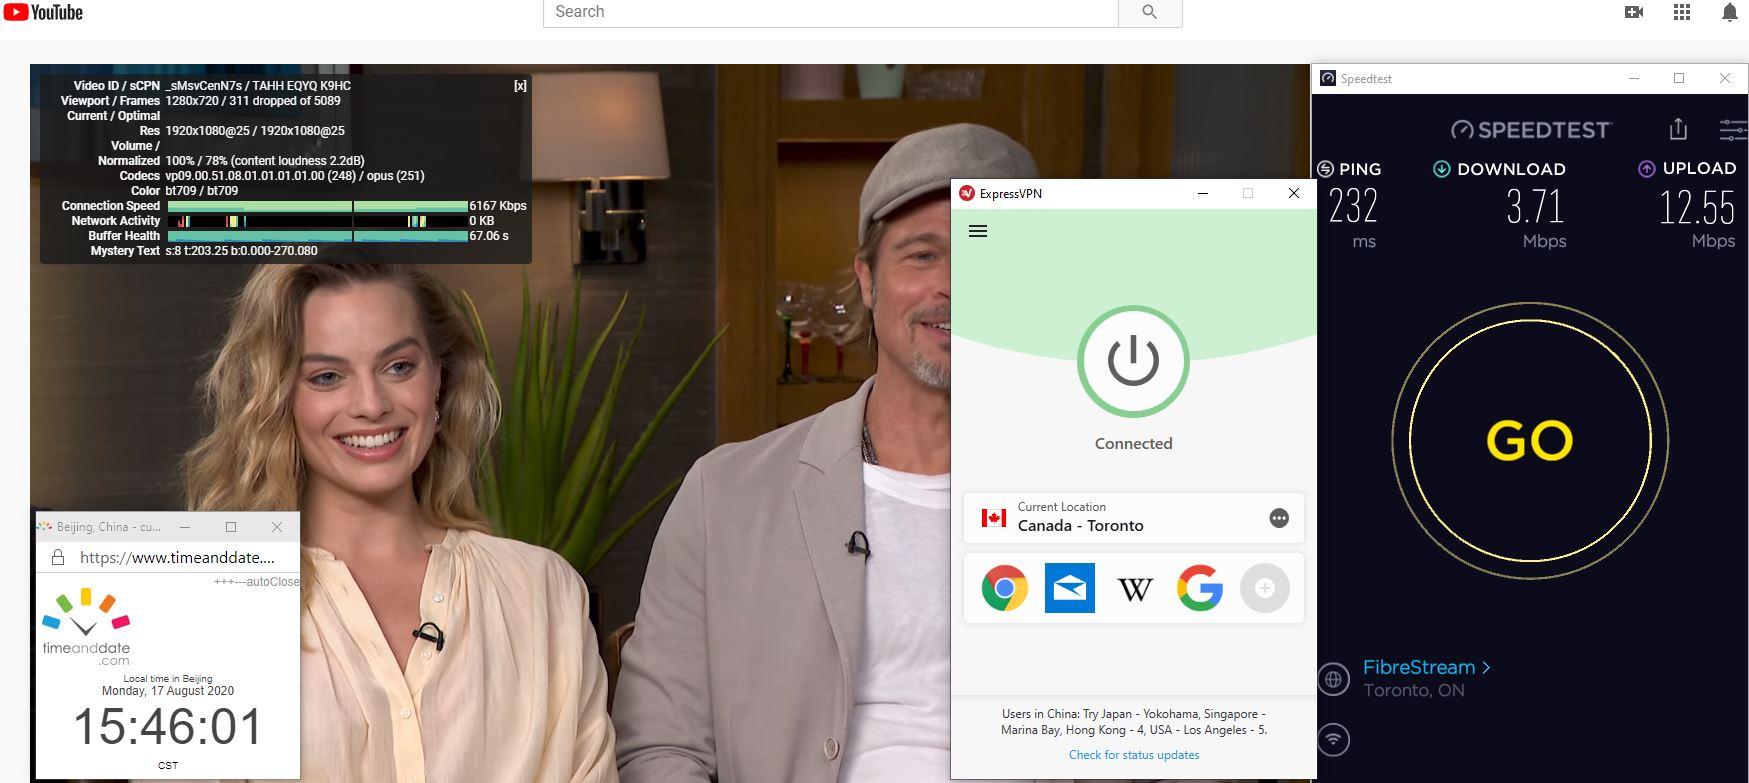 Windows10 ExpressVPN IKEv2协议 Canada - Toronto 中国VPN 翻墙 科学上网 翻墙速度测试 - 20200817-2